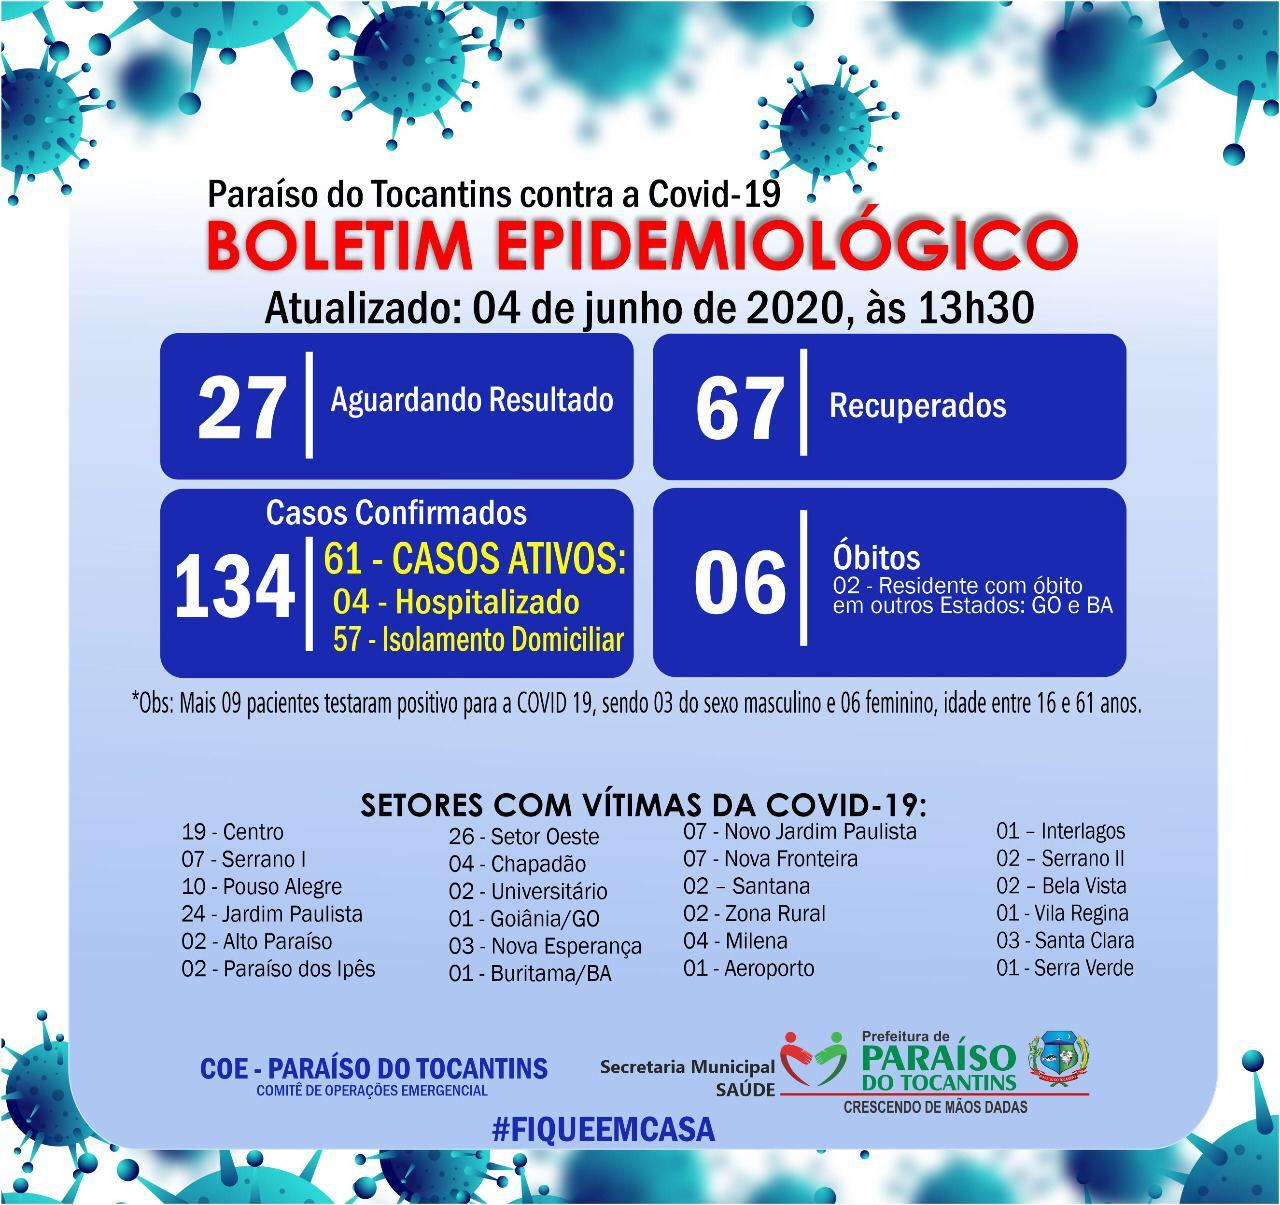 Paraíso confirma 9 novos pacientes positivos para Covid-19 no boletim desta quinta-feira